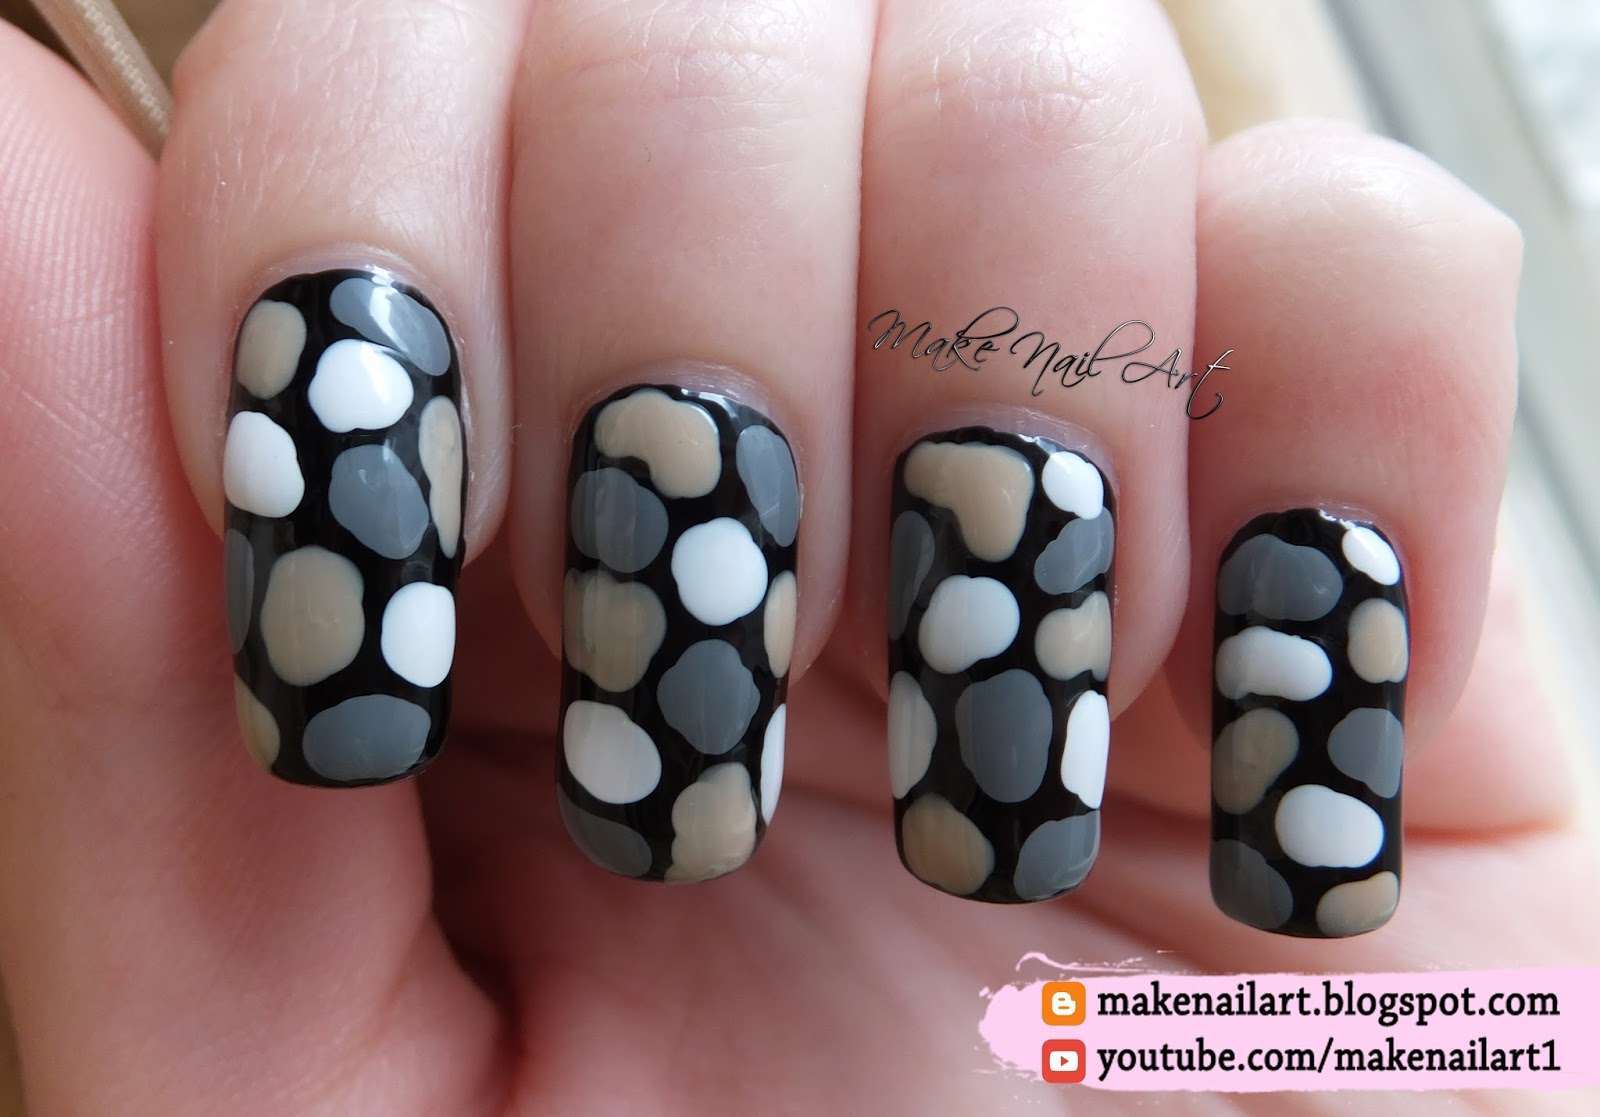 Make Nail Art: February 2016